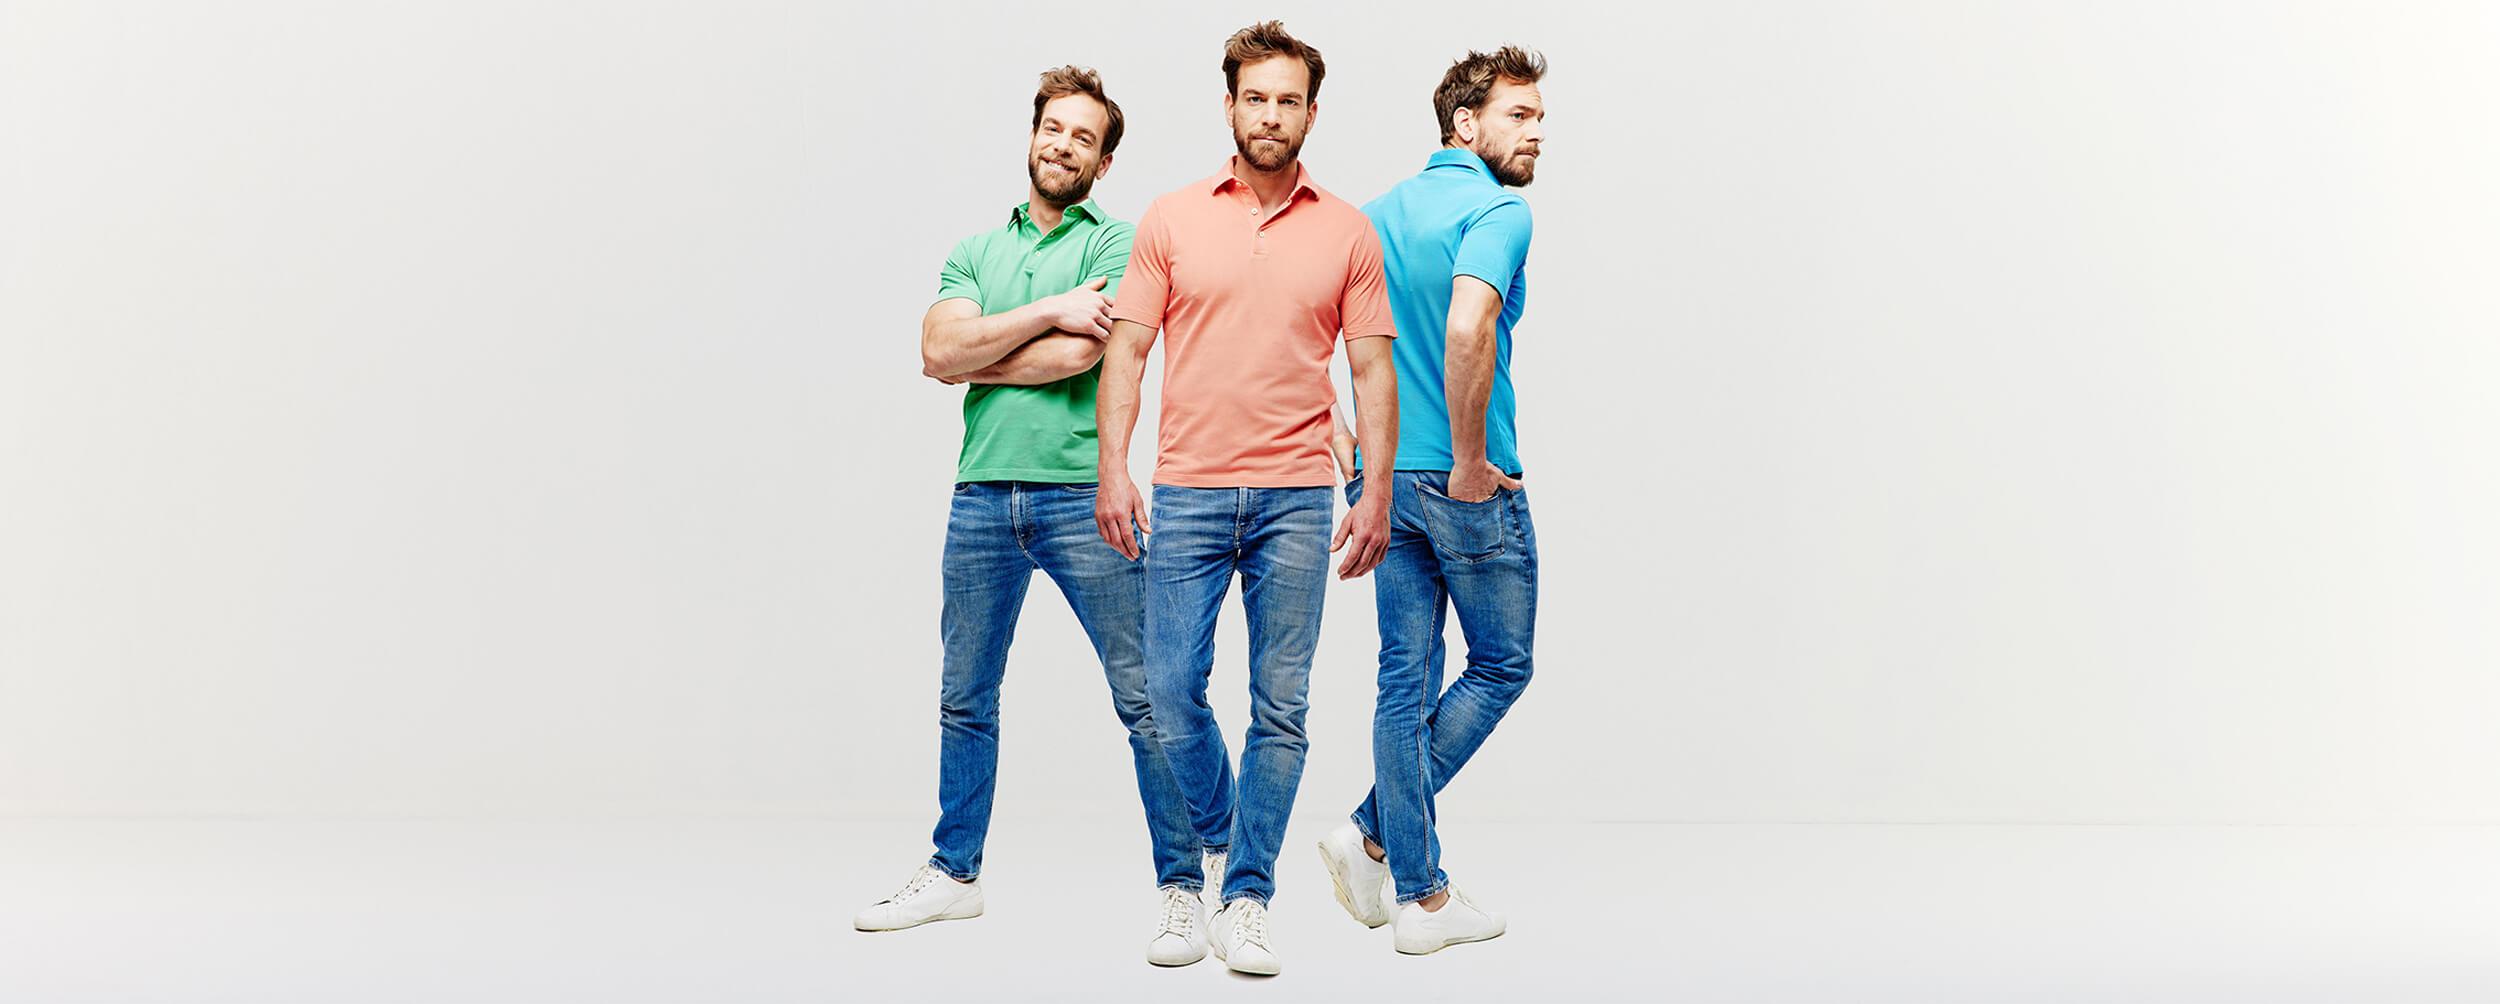 S. Moritz classic clothing